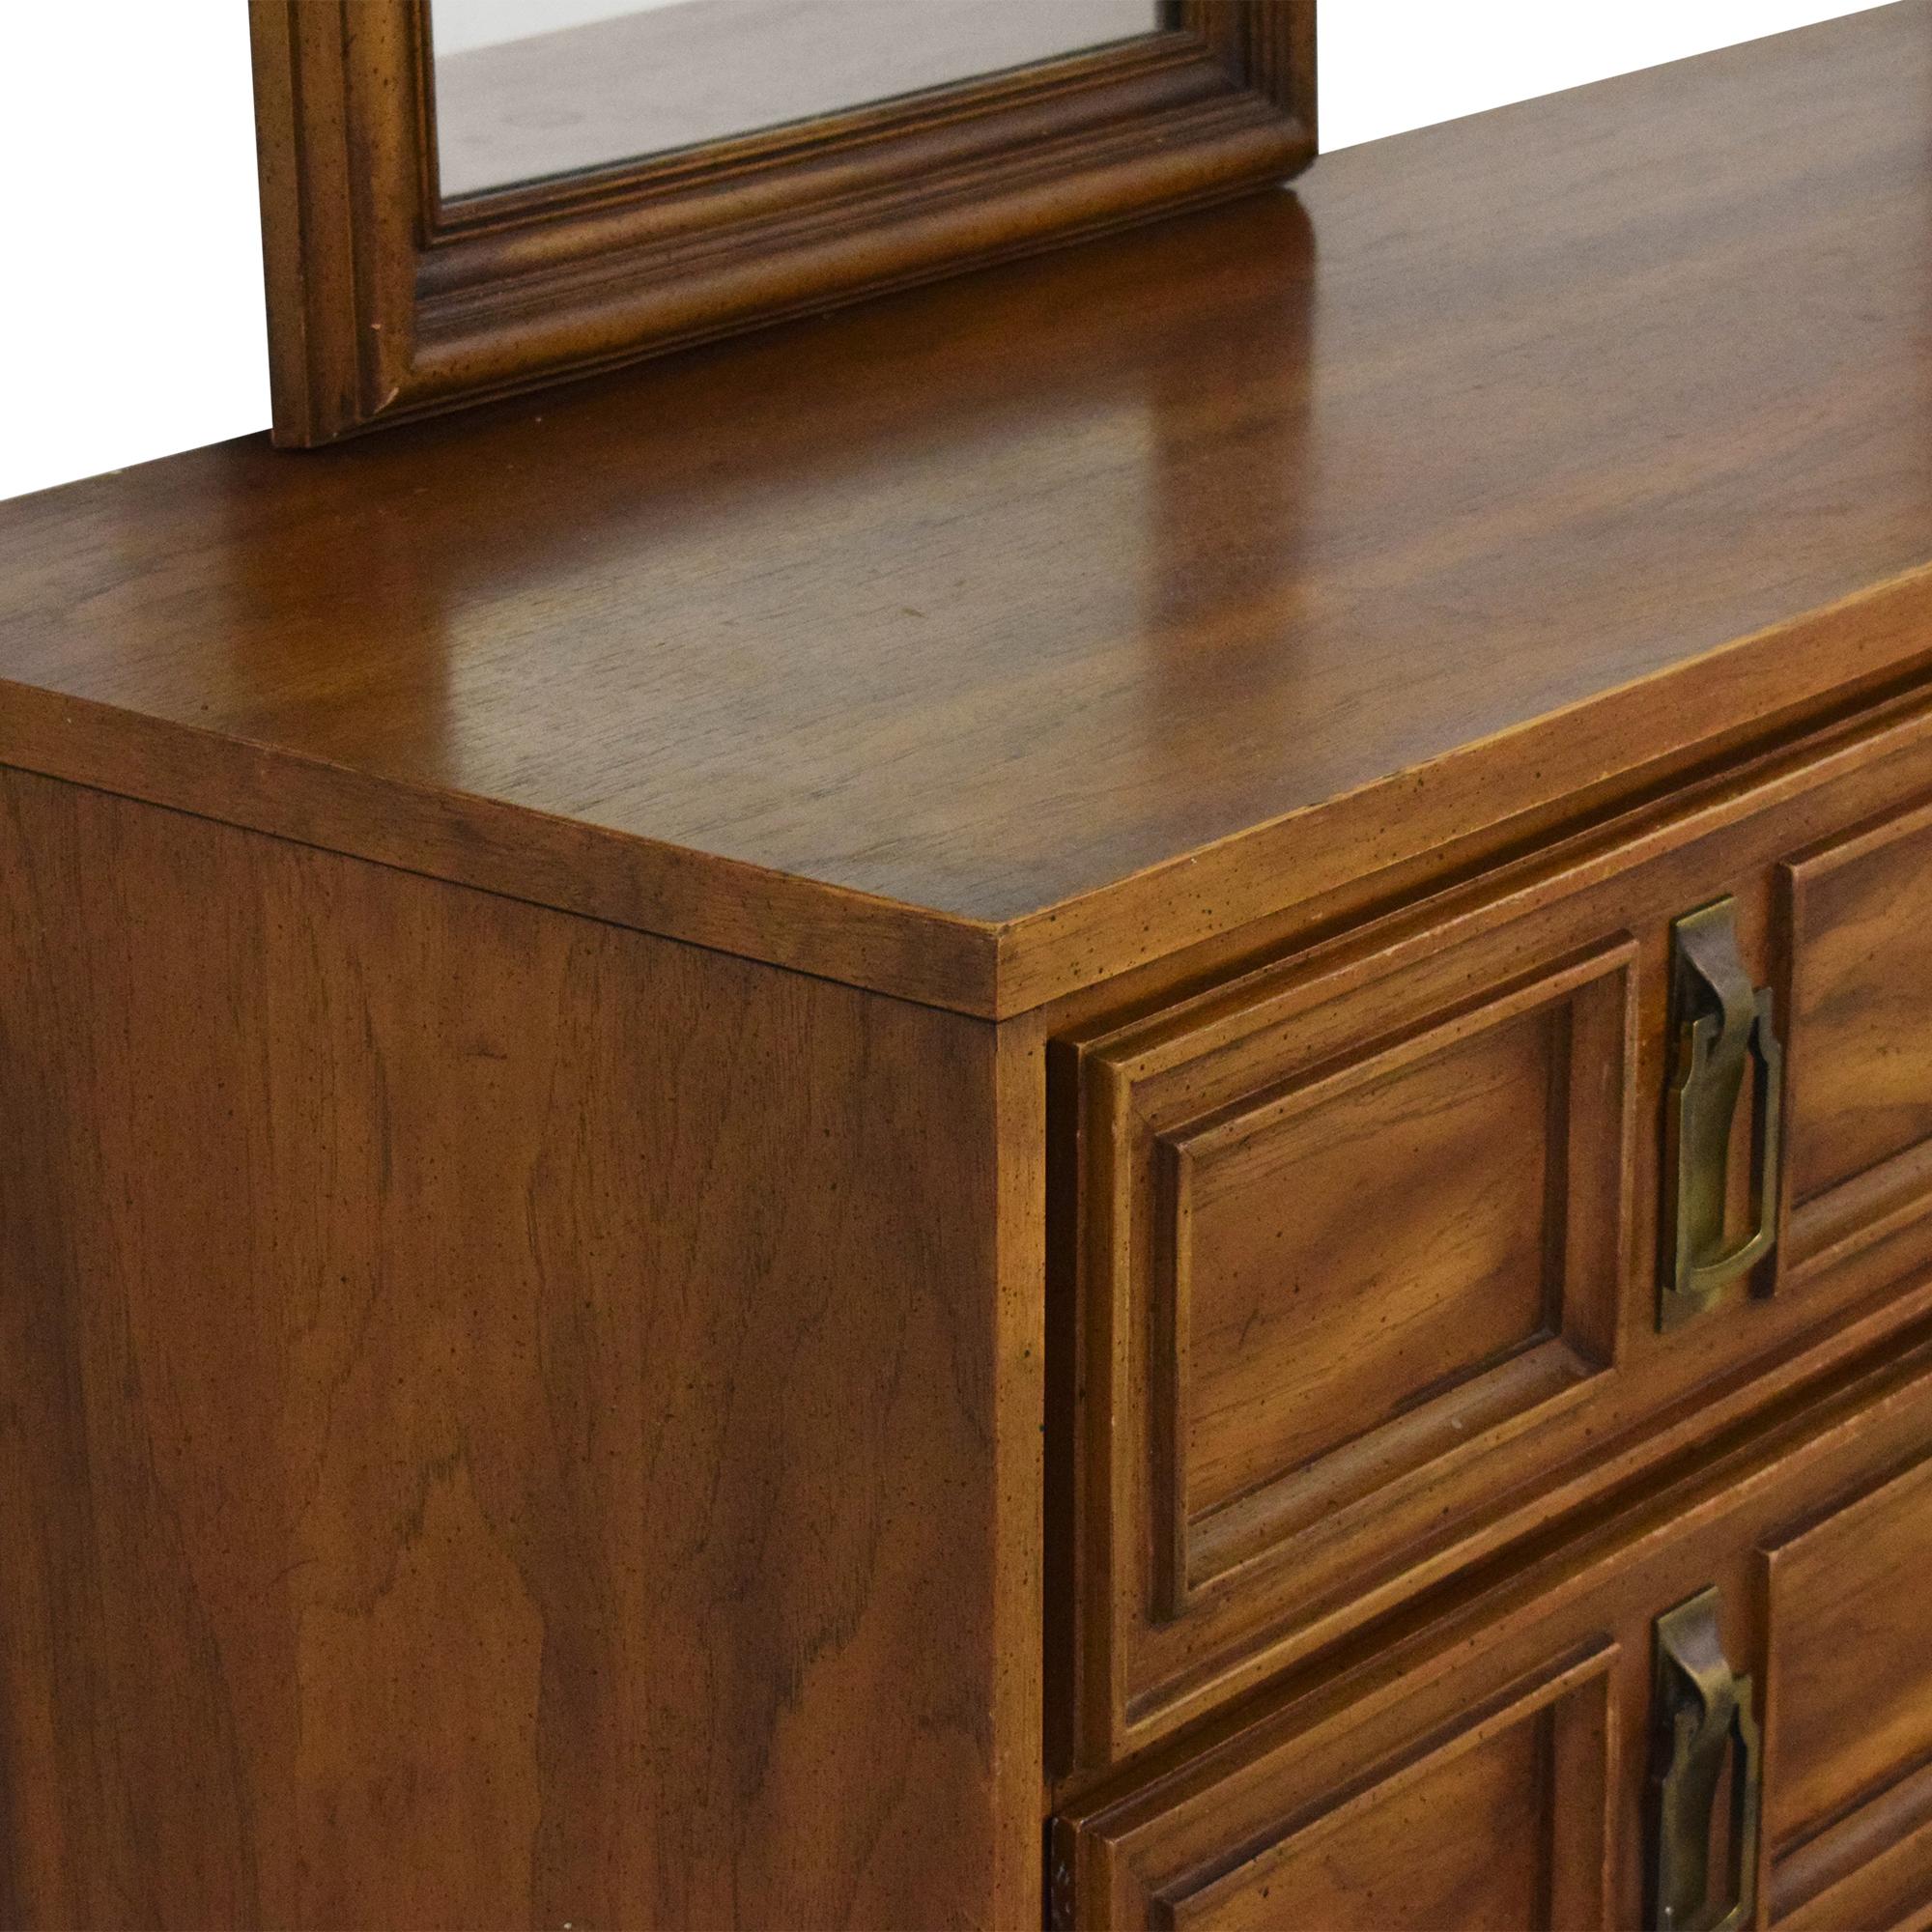 Stanley Furniture Stanley Furniture Triple Dresser with Mirrors